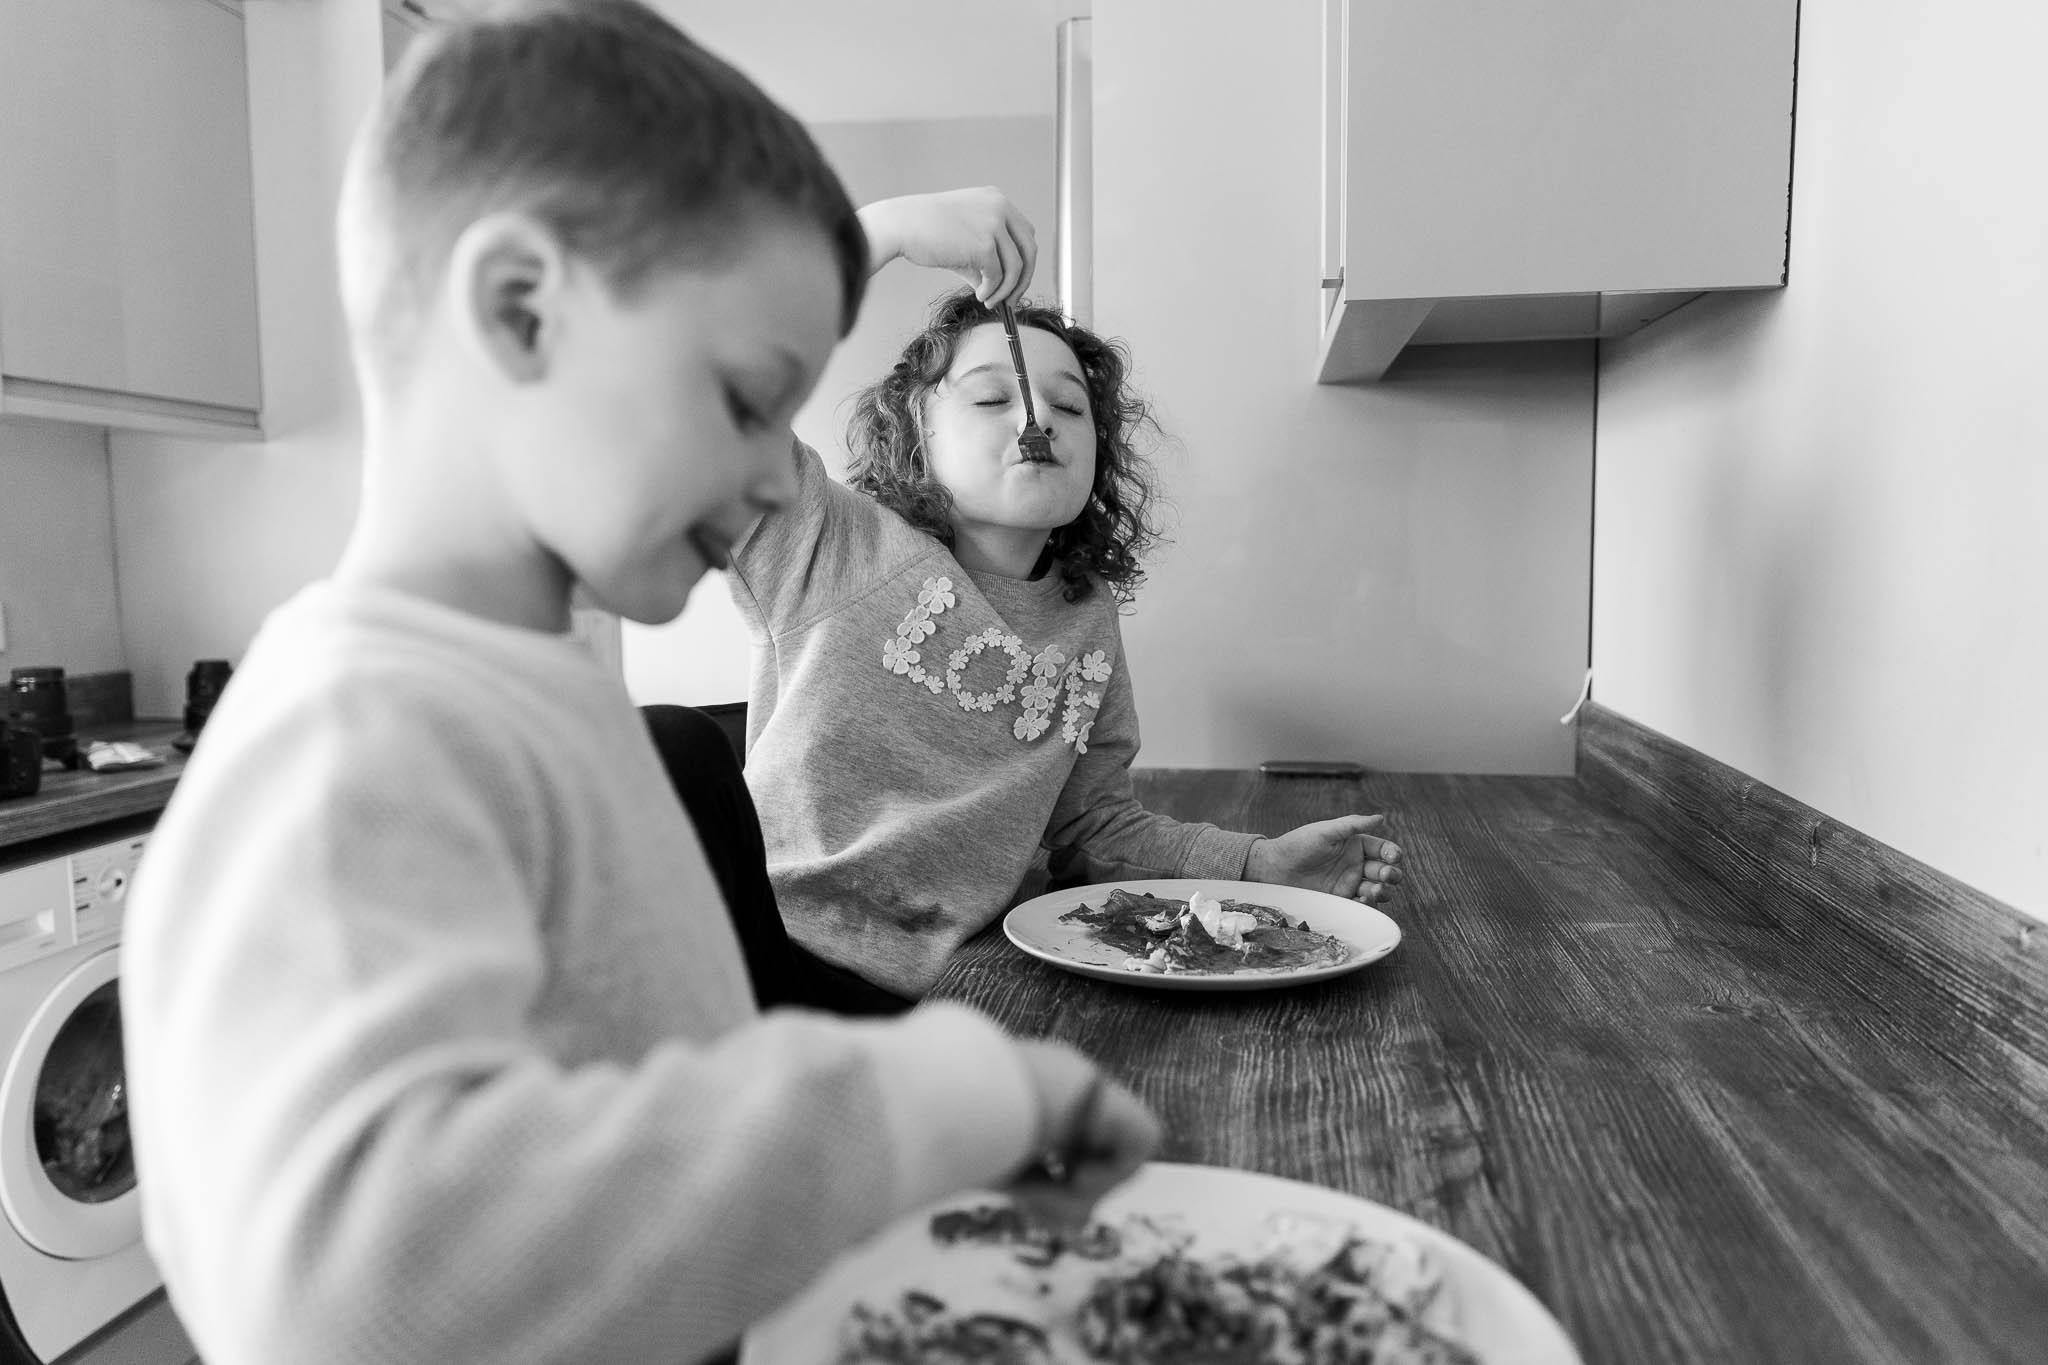 kids eating their home made pancakes